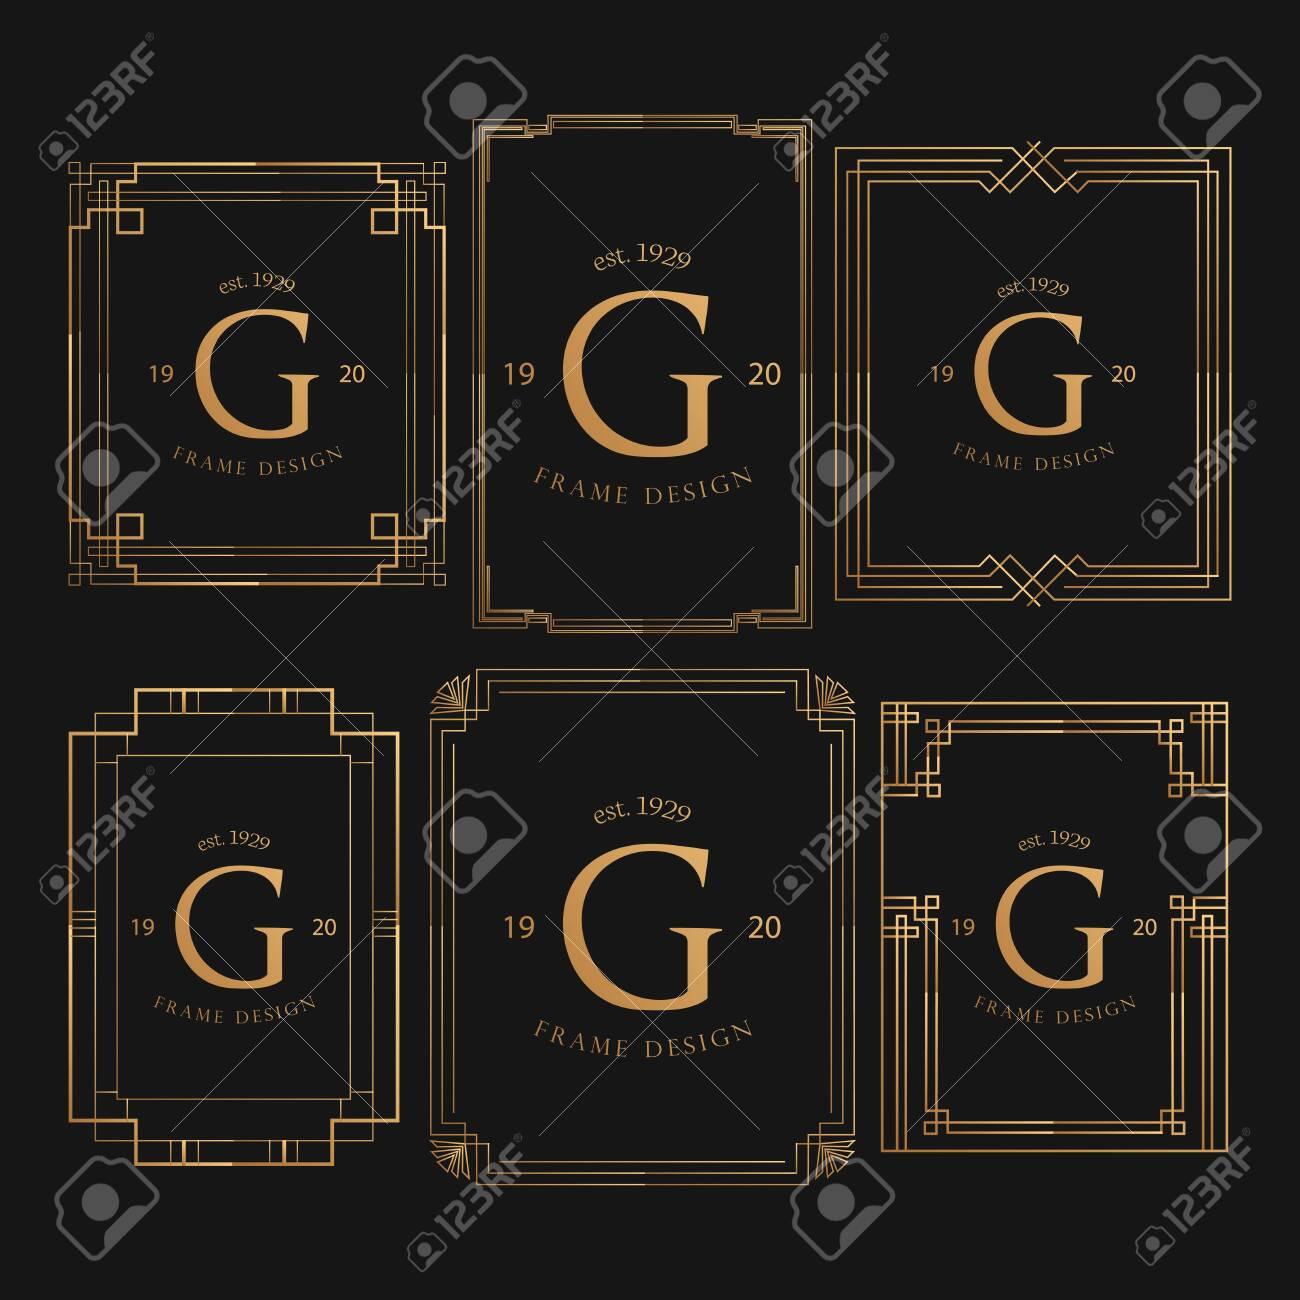 Set Of Golden Frame Luxury. Frame Luxury with Golden Color, Ornament Concept, Luxurious Badges, Gold Label, Retro Concept. Trendy Vintage Royal Ornament Frames Illustration, Good for Hotel Brand. - 145506780